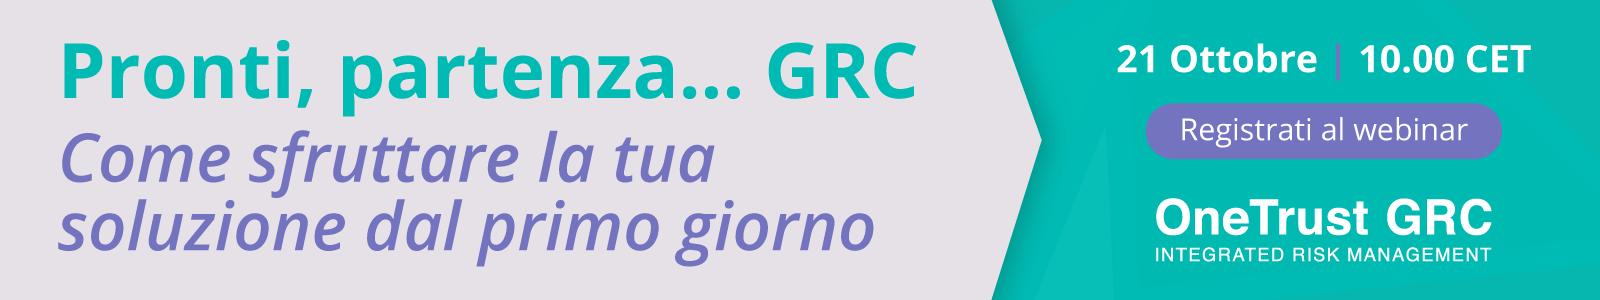 20210927-GRC-ReadySetGRC-DigitalAd-RegisterNow-IT-1600x300px Top Banner